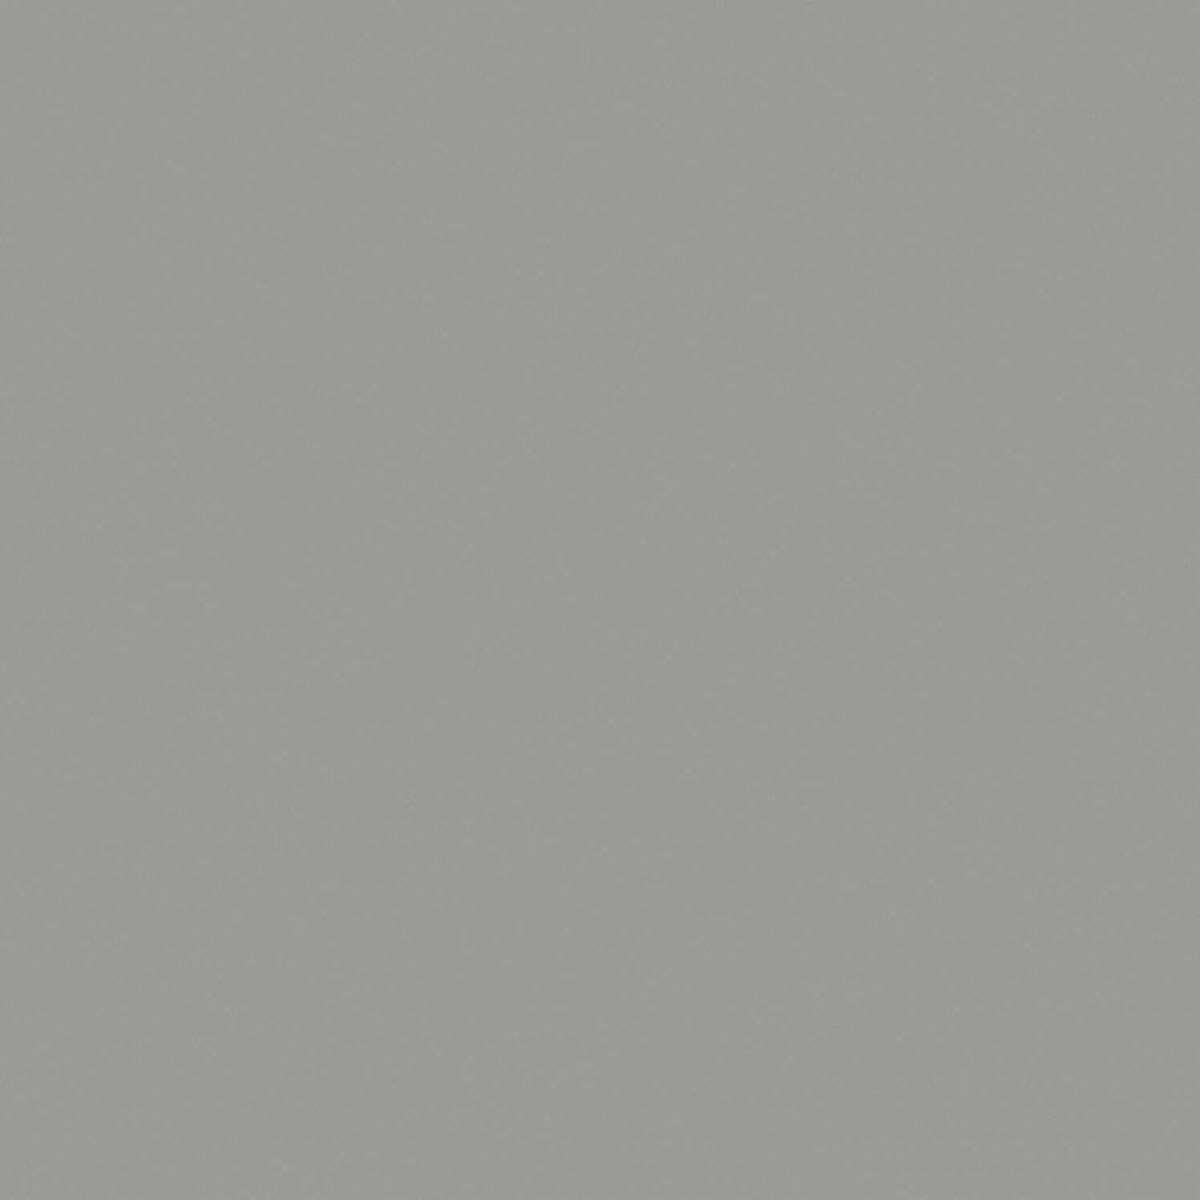 Formica Brand Laminate 03036T9CK410200 Gray Laminate, Gray Chalkboard